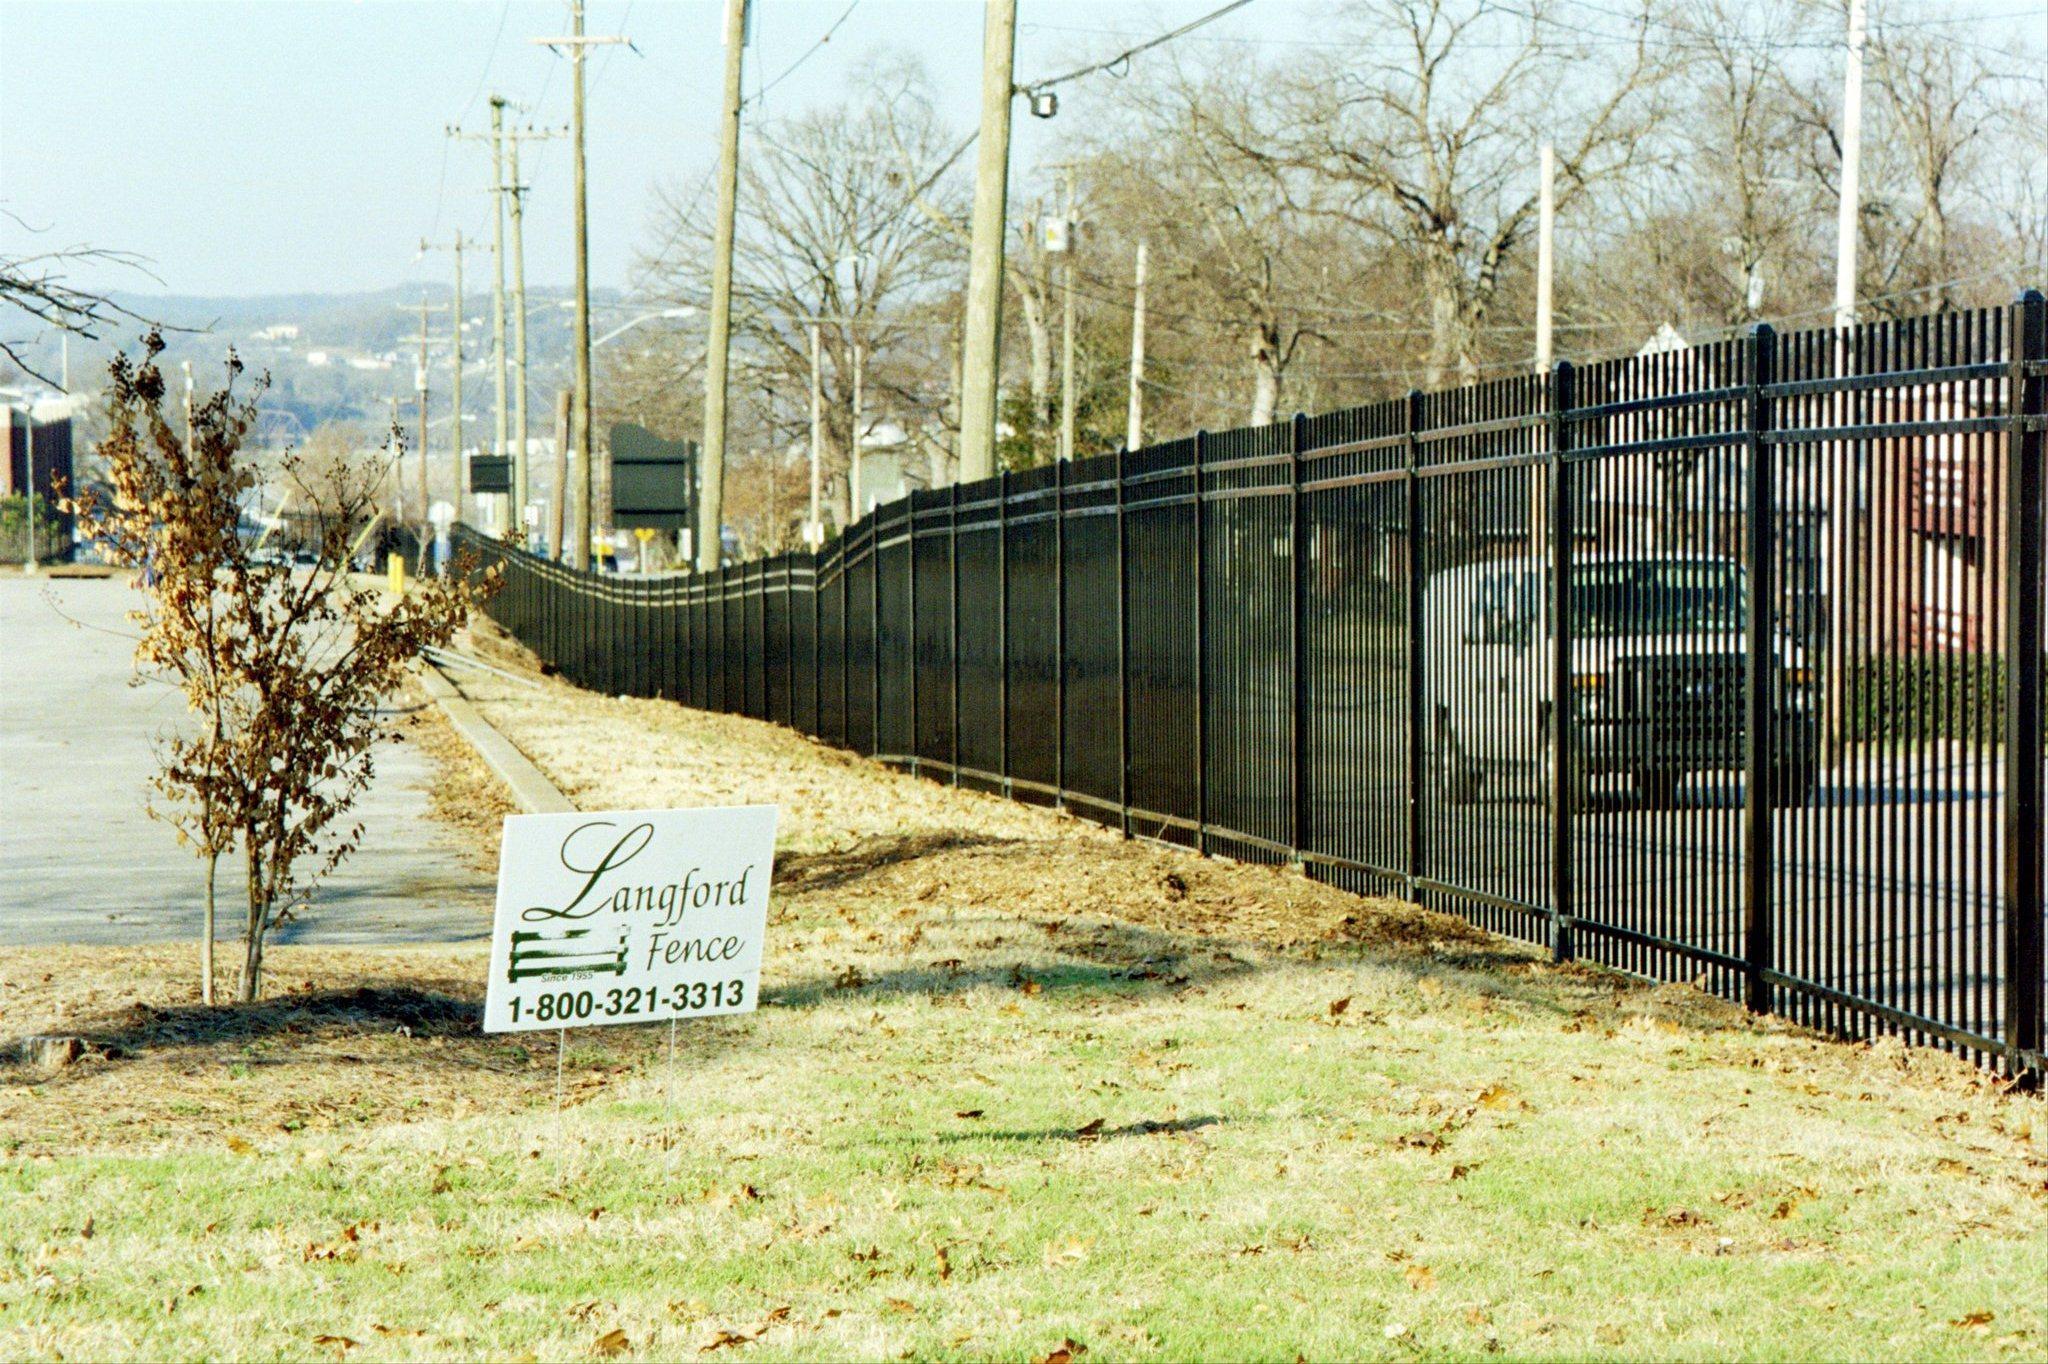 Langford Fence Co., Inc.